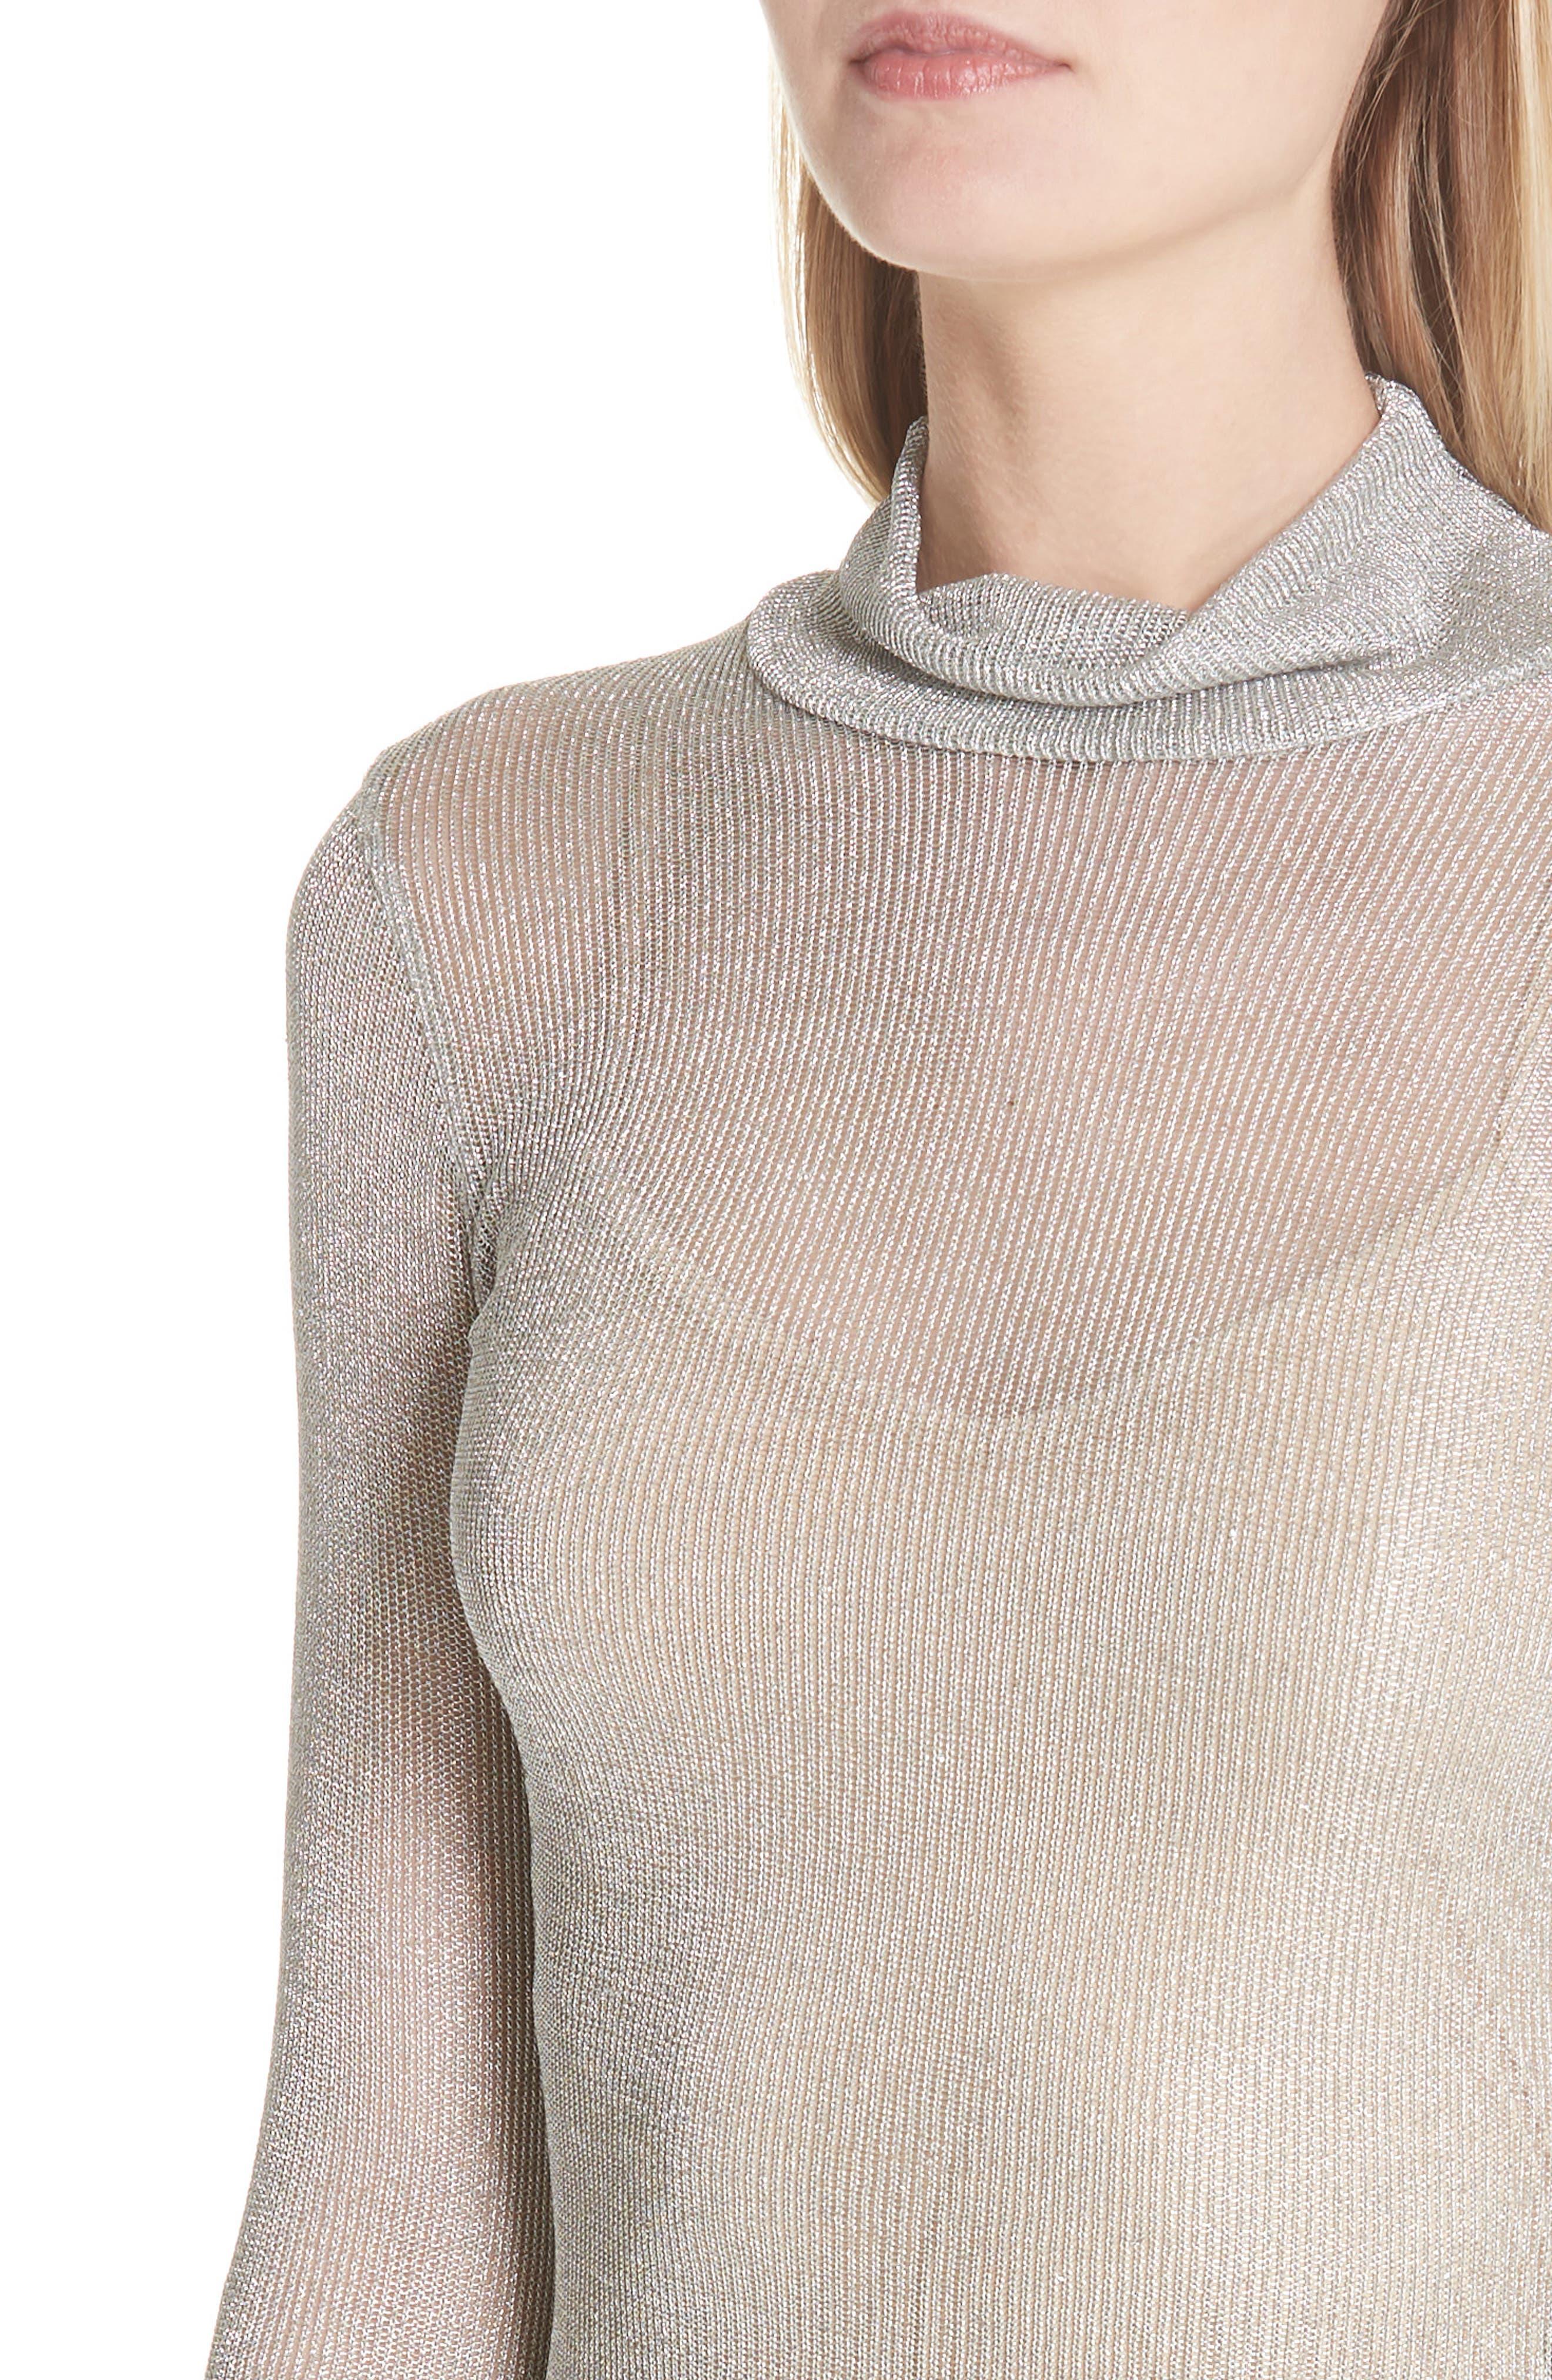 Metallic Rib Turtleneck Dress,                             Alternate thumbnail 4, color,                             SM - SILVER MESH